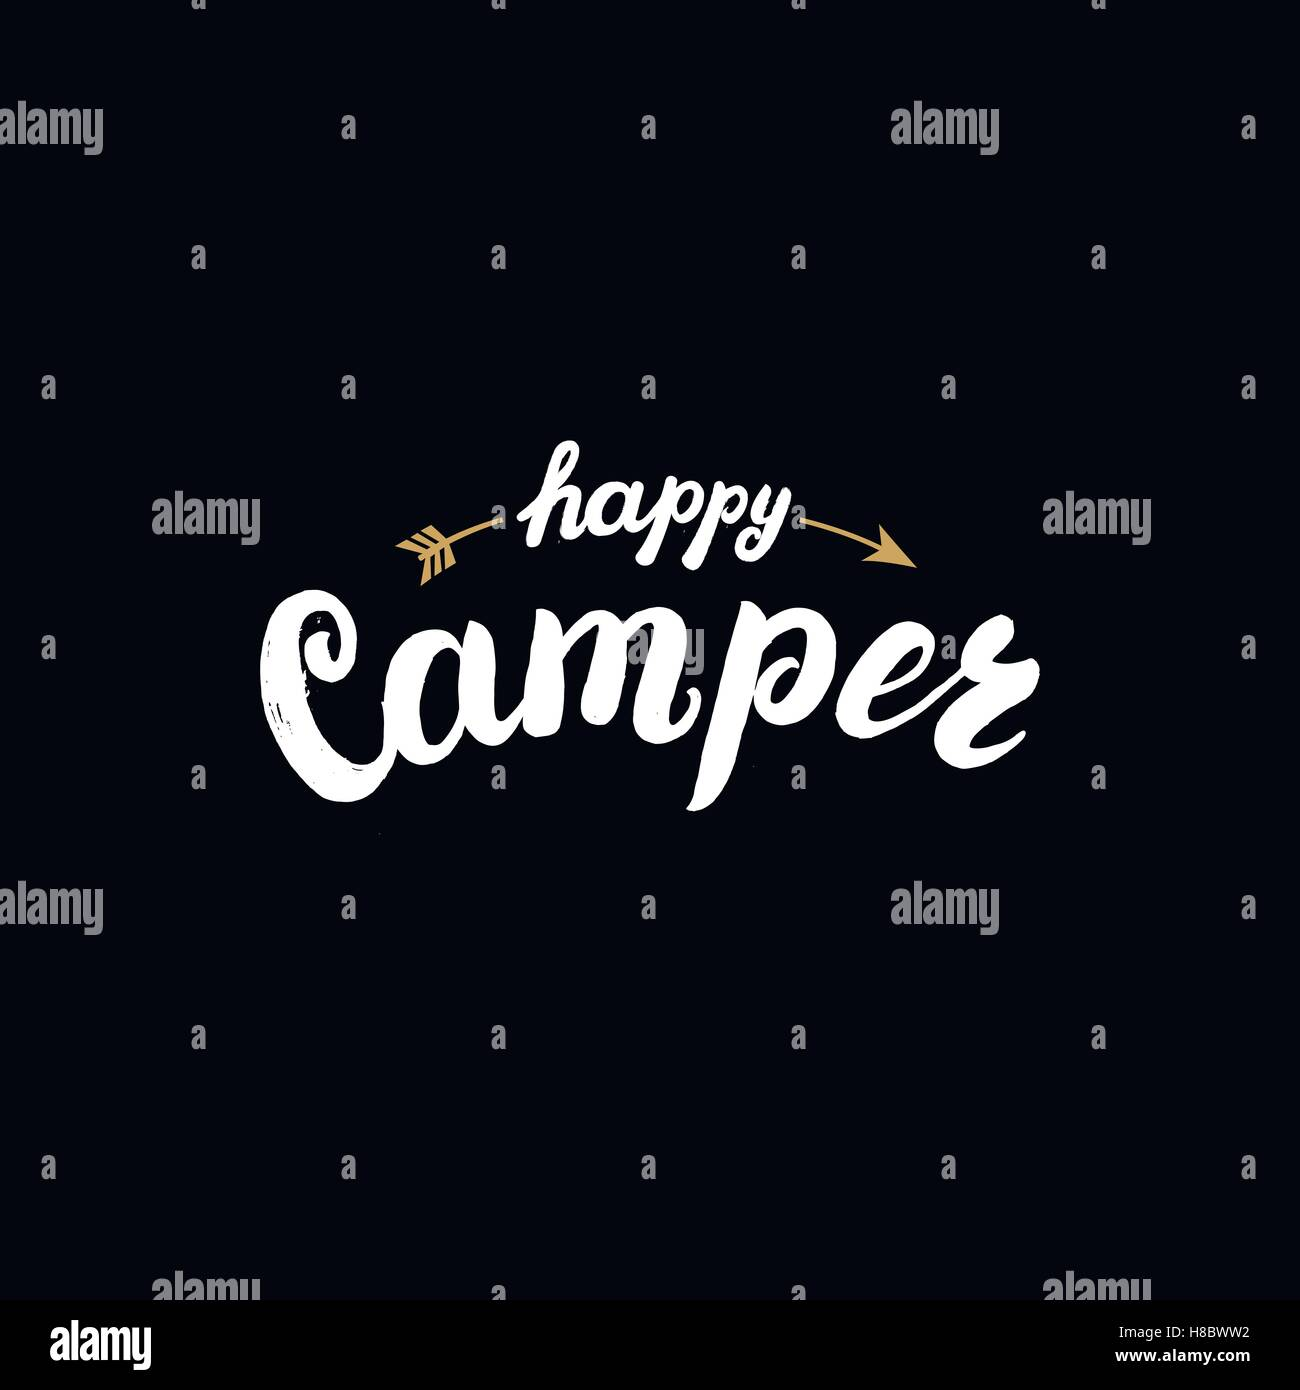 Happy Camper Hand Written Lettered Badge Phrase Apparel Design On Black Background Tee Print Vector Illustration